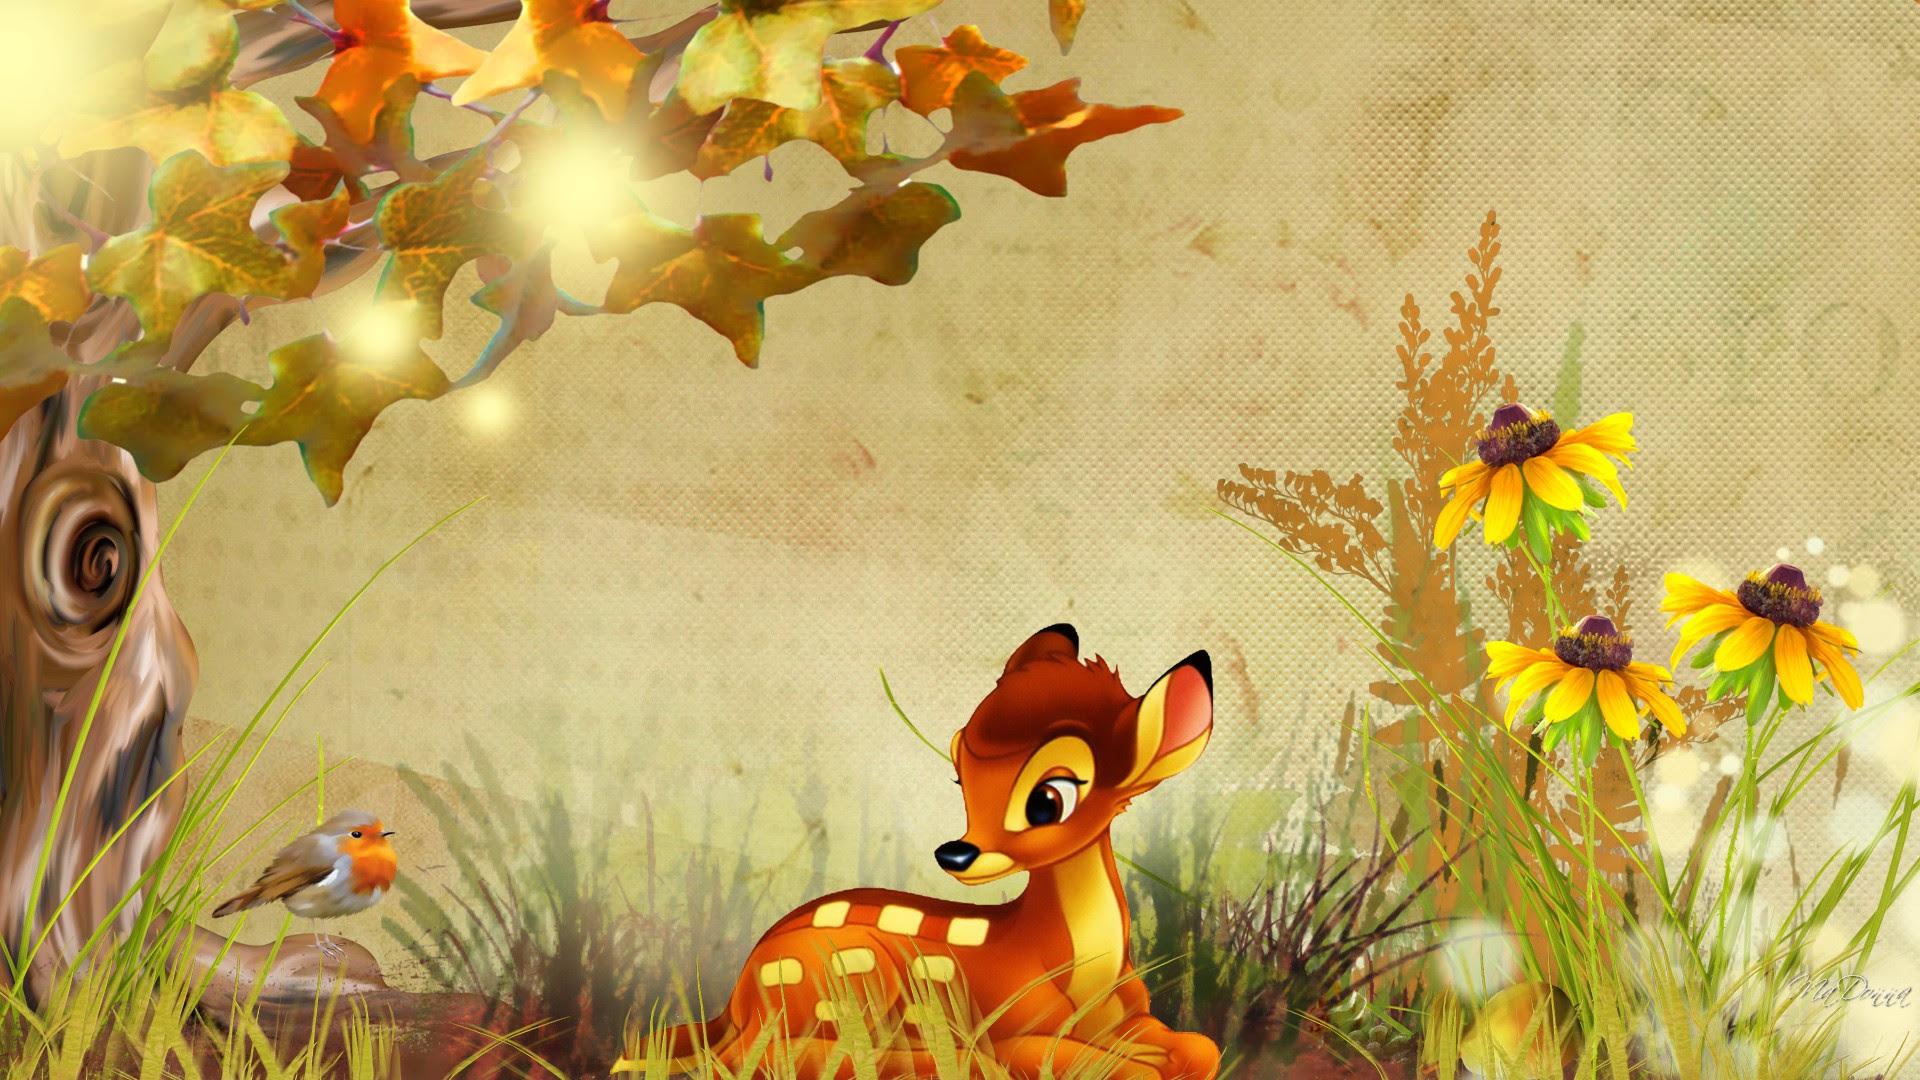 Free Snoopy Fall Wallpaper 403 Besten Snoopy Bilder Auf Pinterest